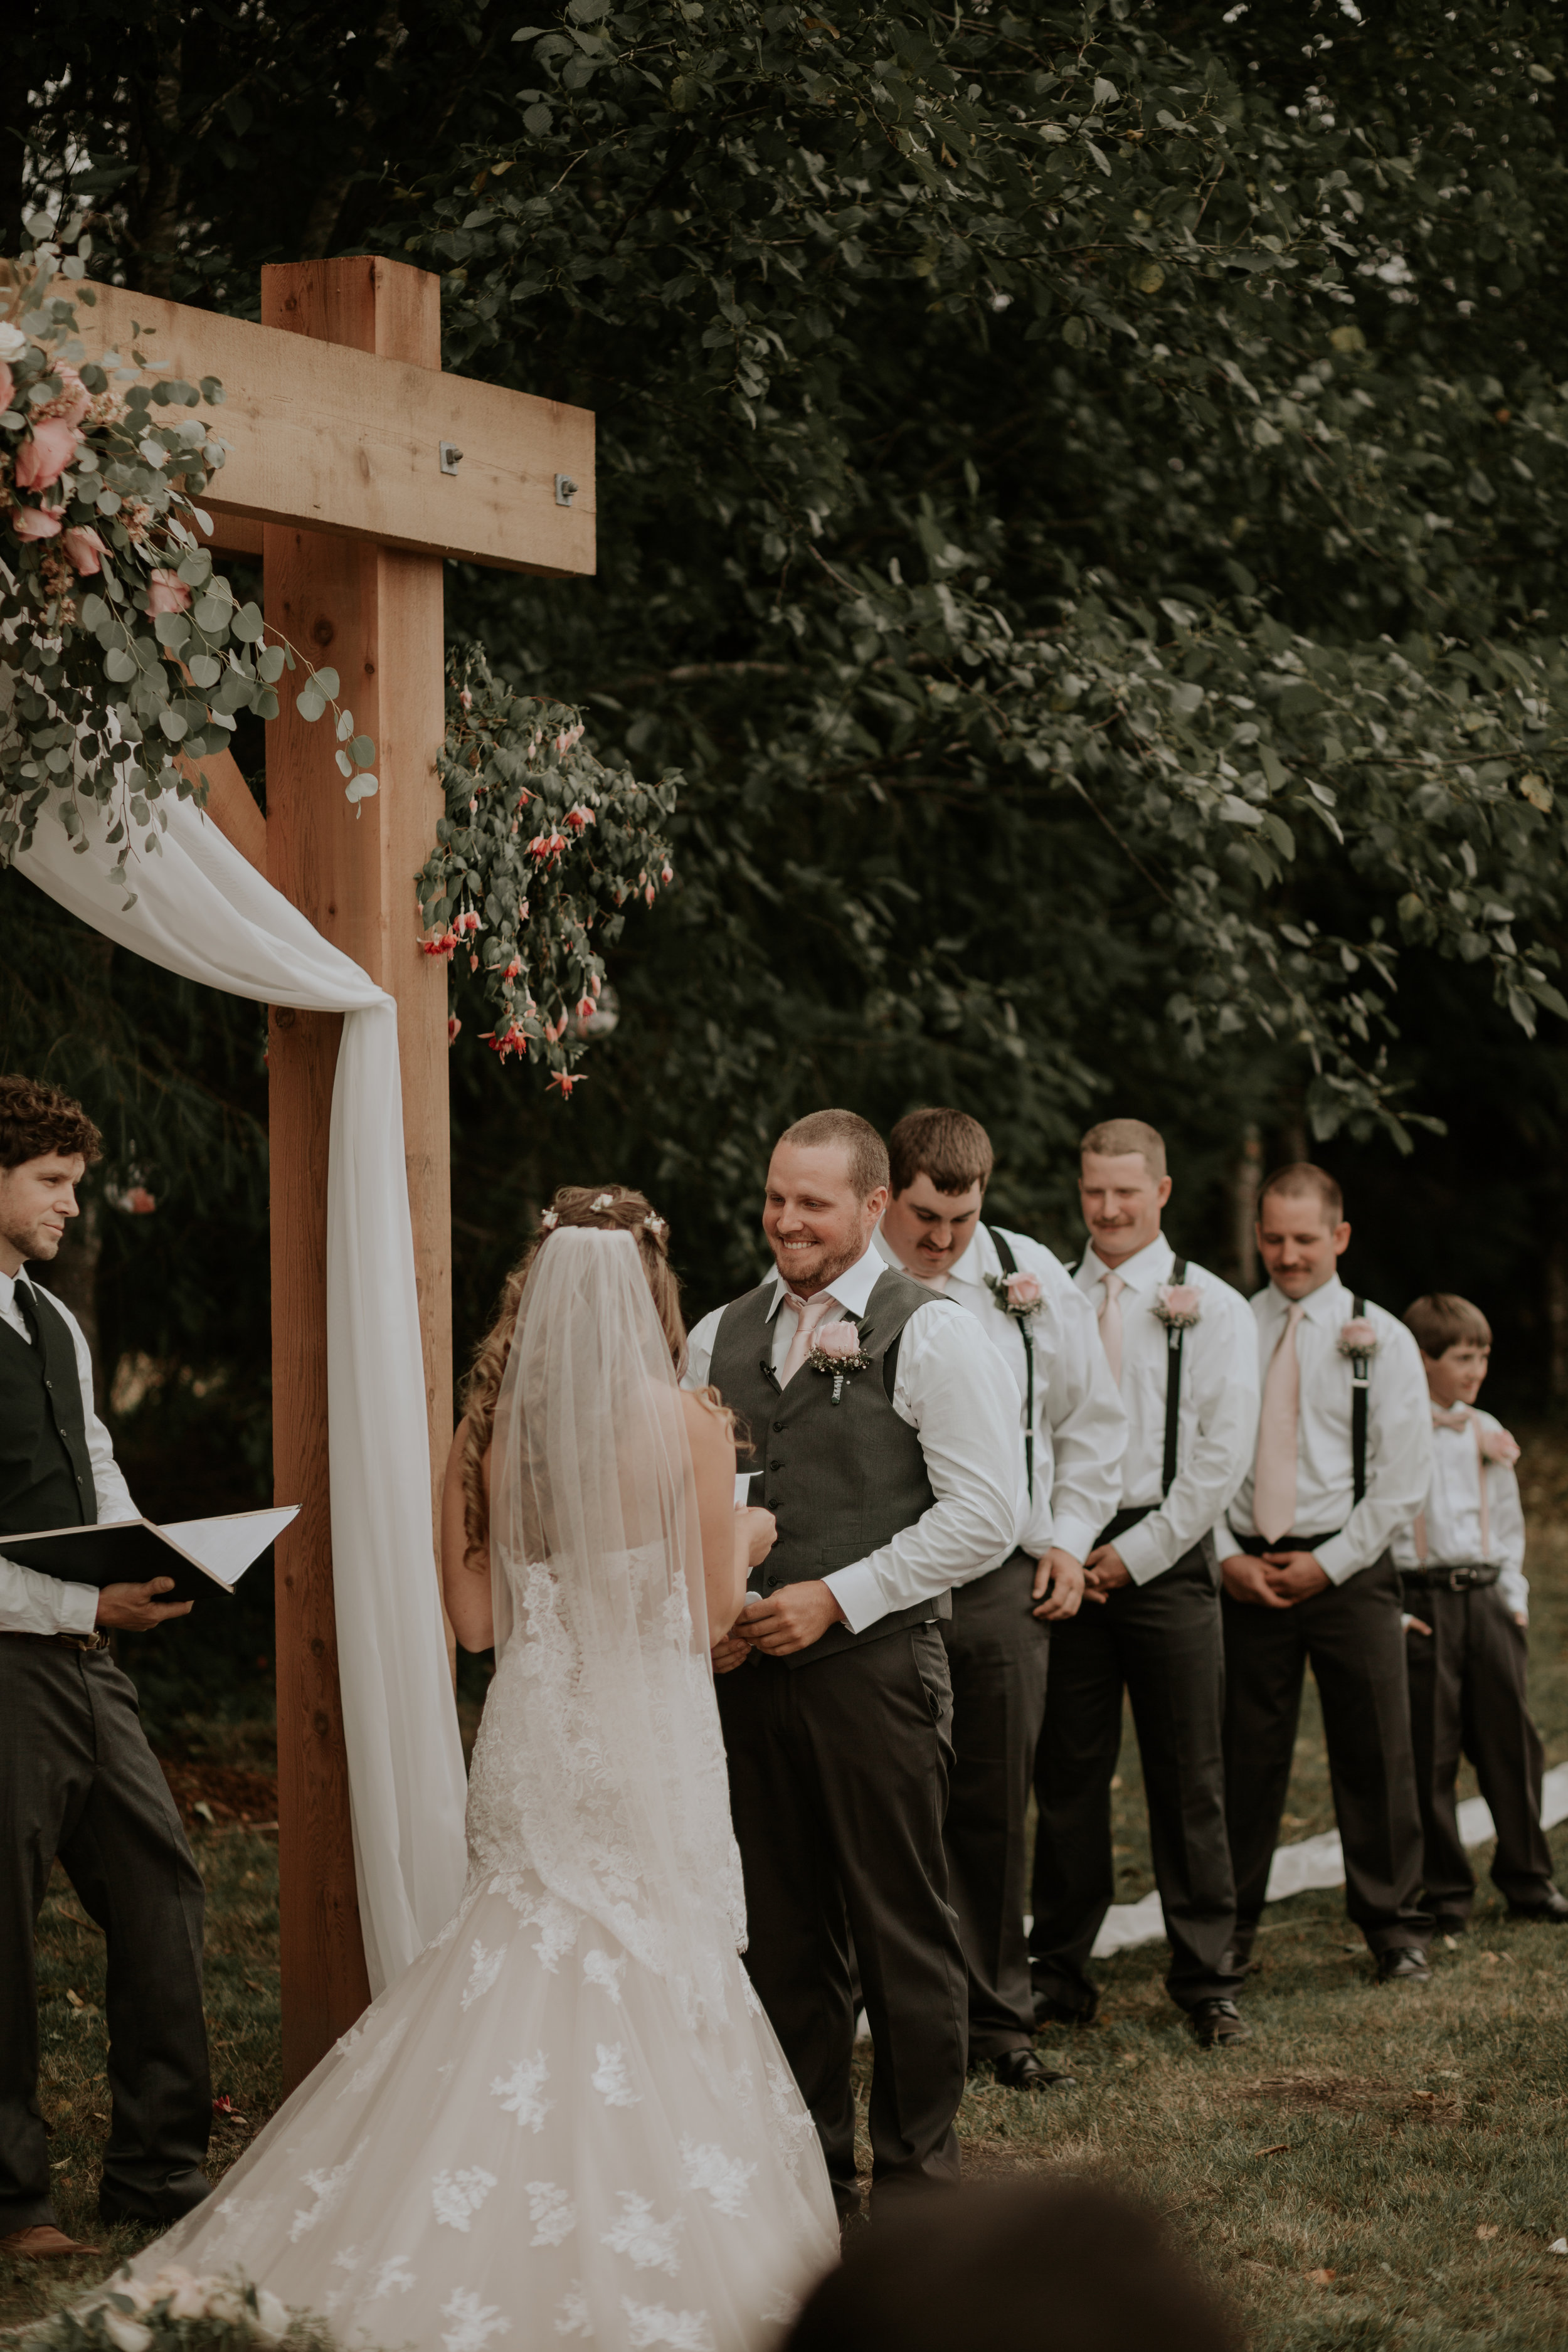 Olympic-Peninsula-Wedding-Photographer-PNW-Forks-Port-Angeles-Kayla-Dawn-Photography-engagement-Olympic-National-Park-47.jpg